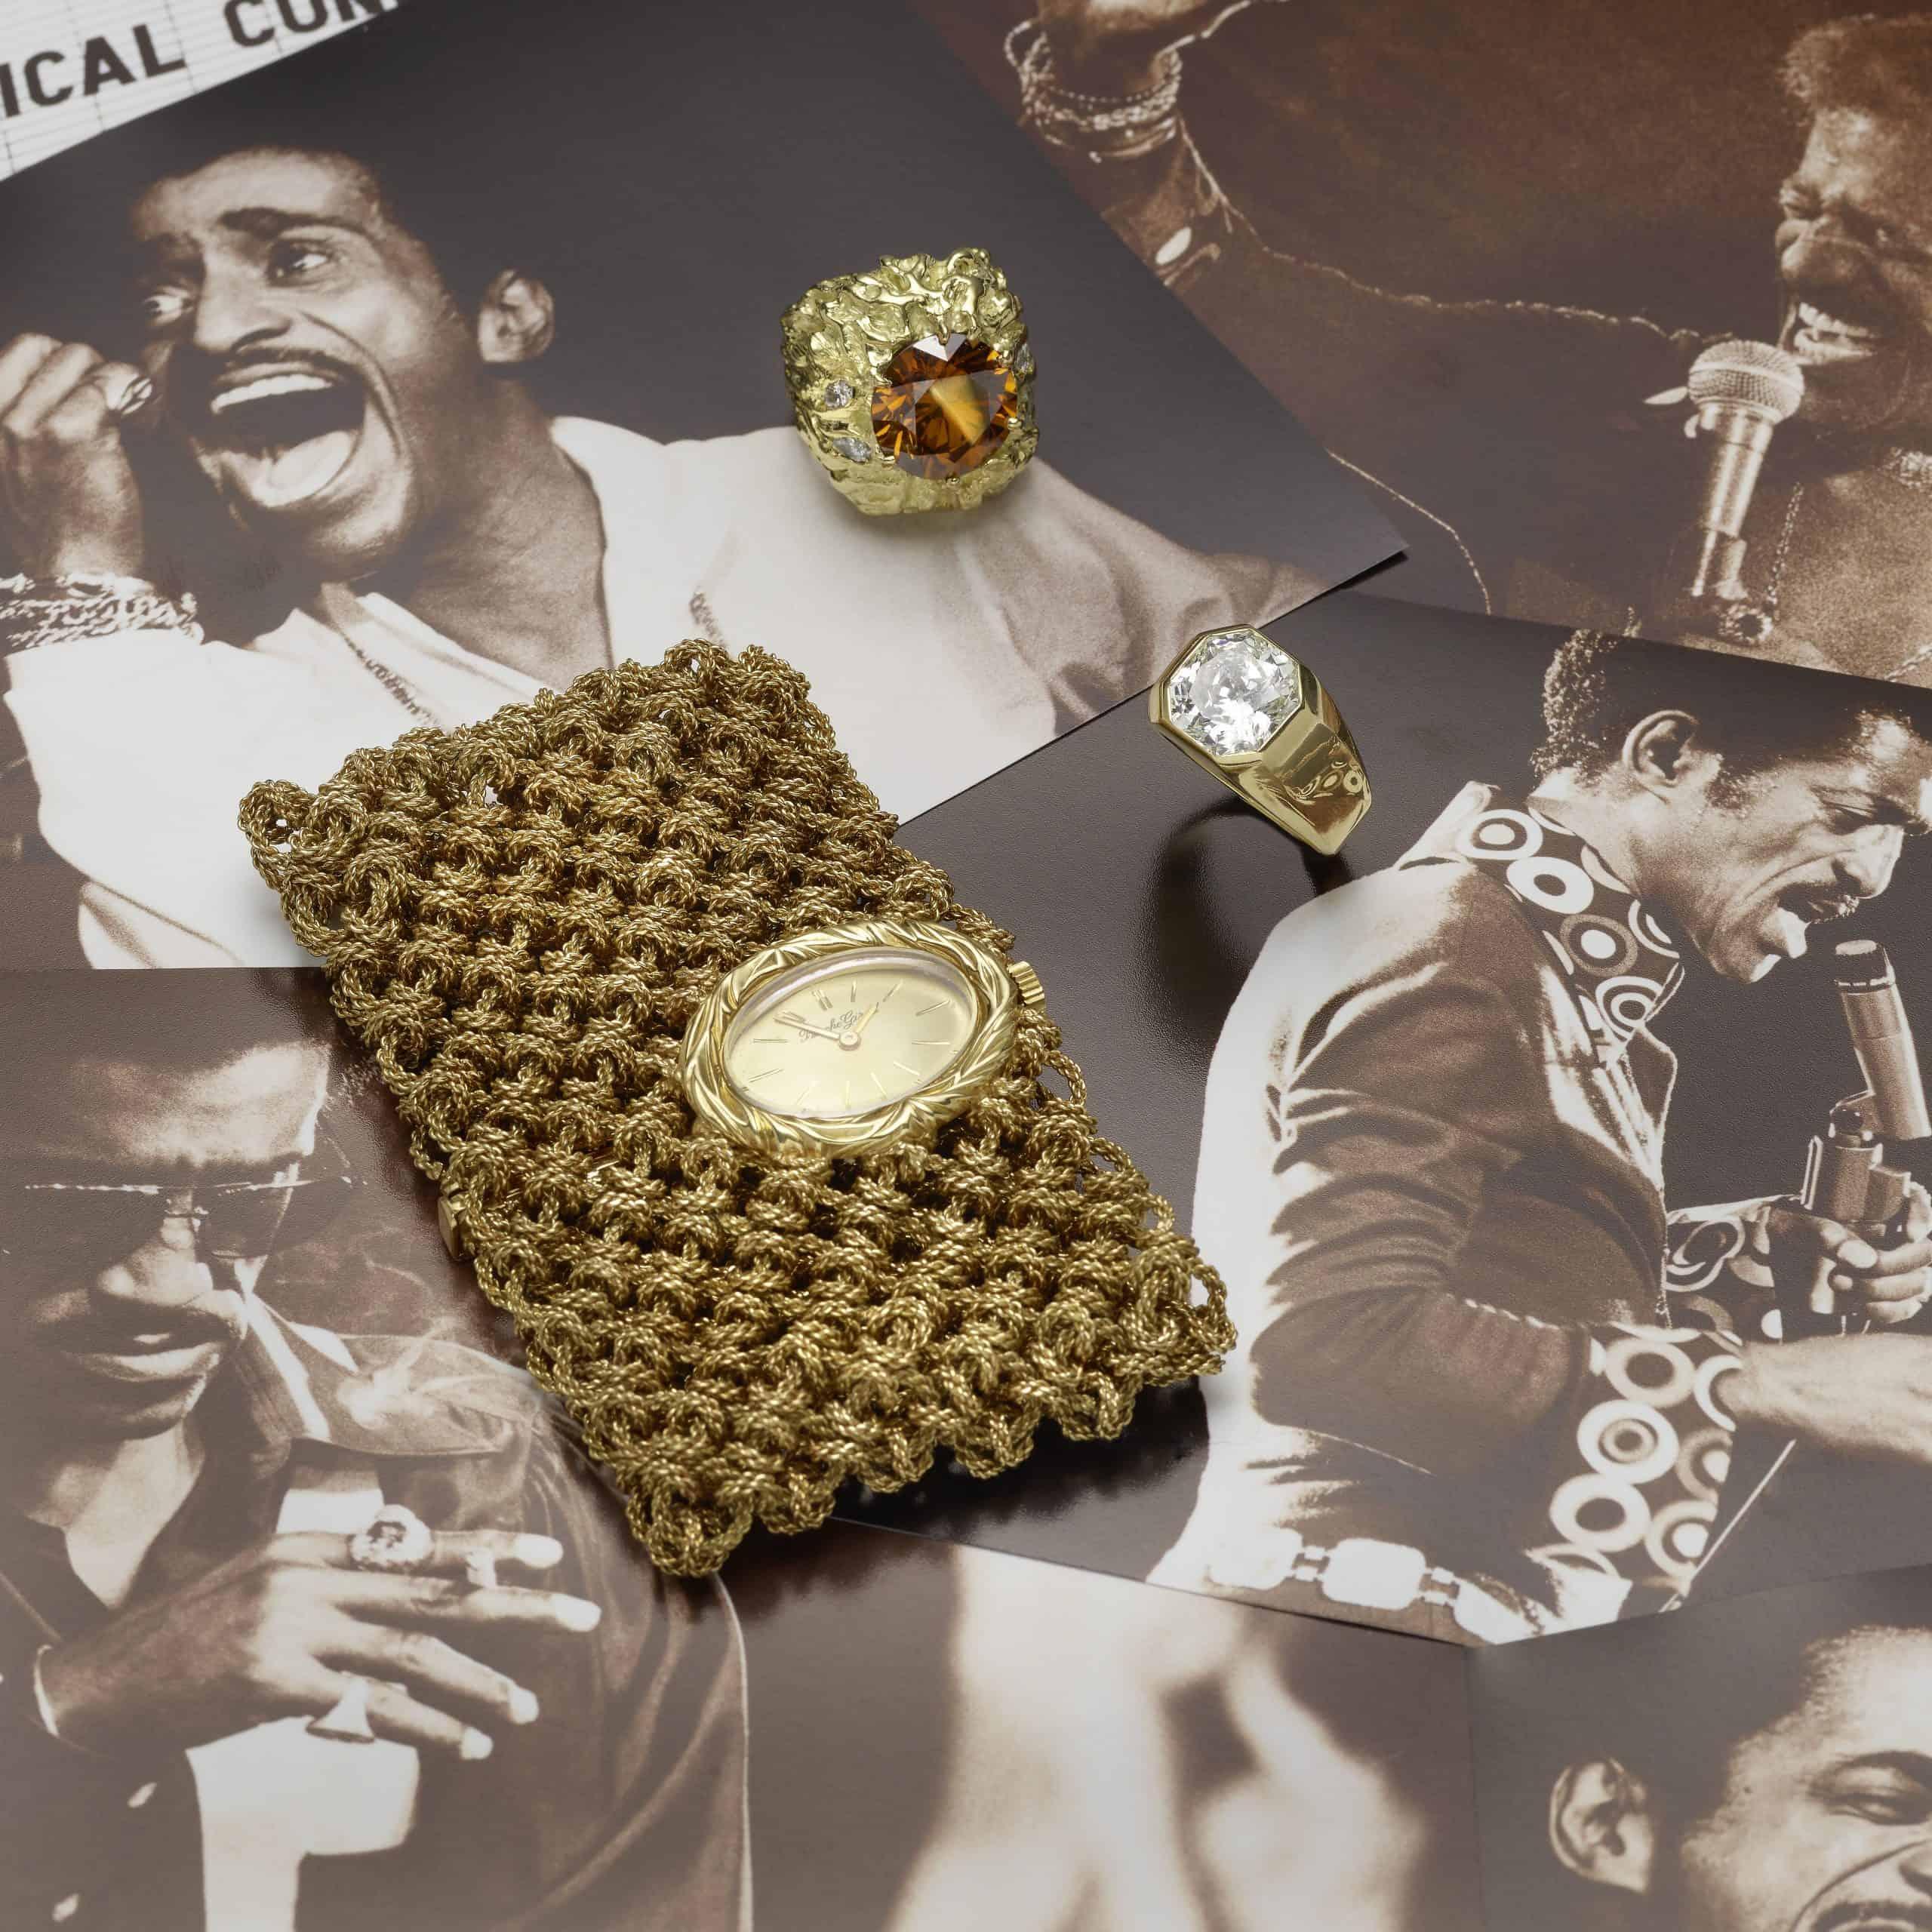 Sammy Davis Jr Assortment of jewelry